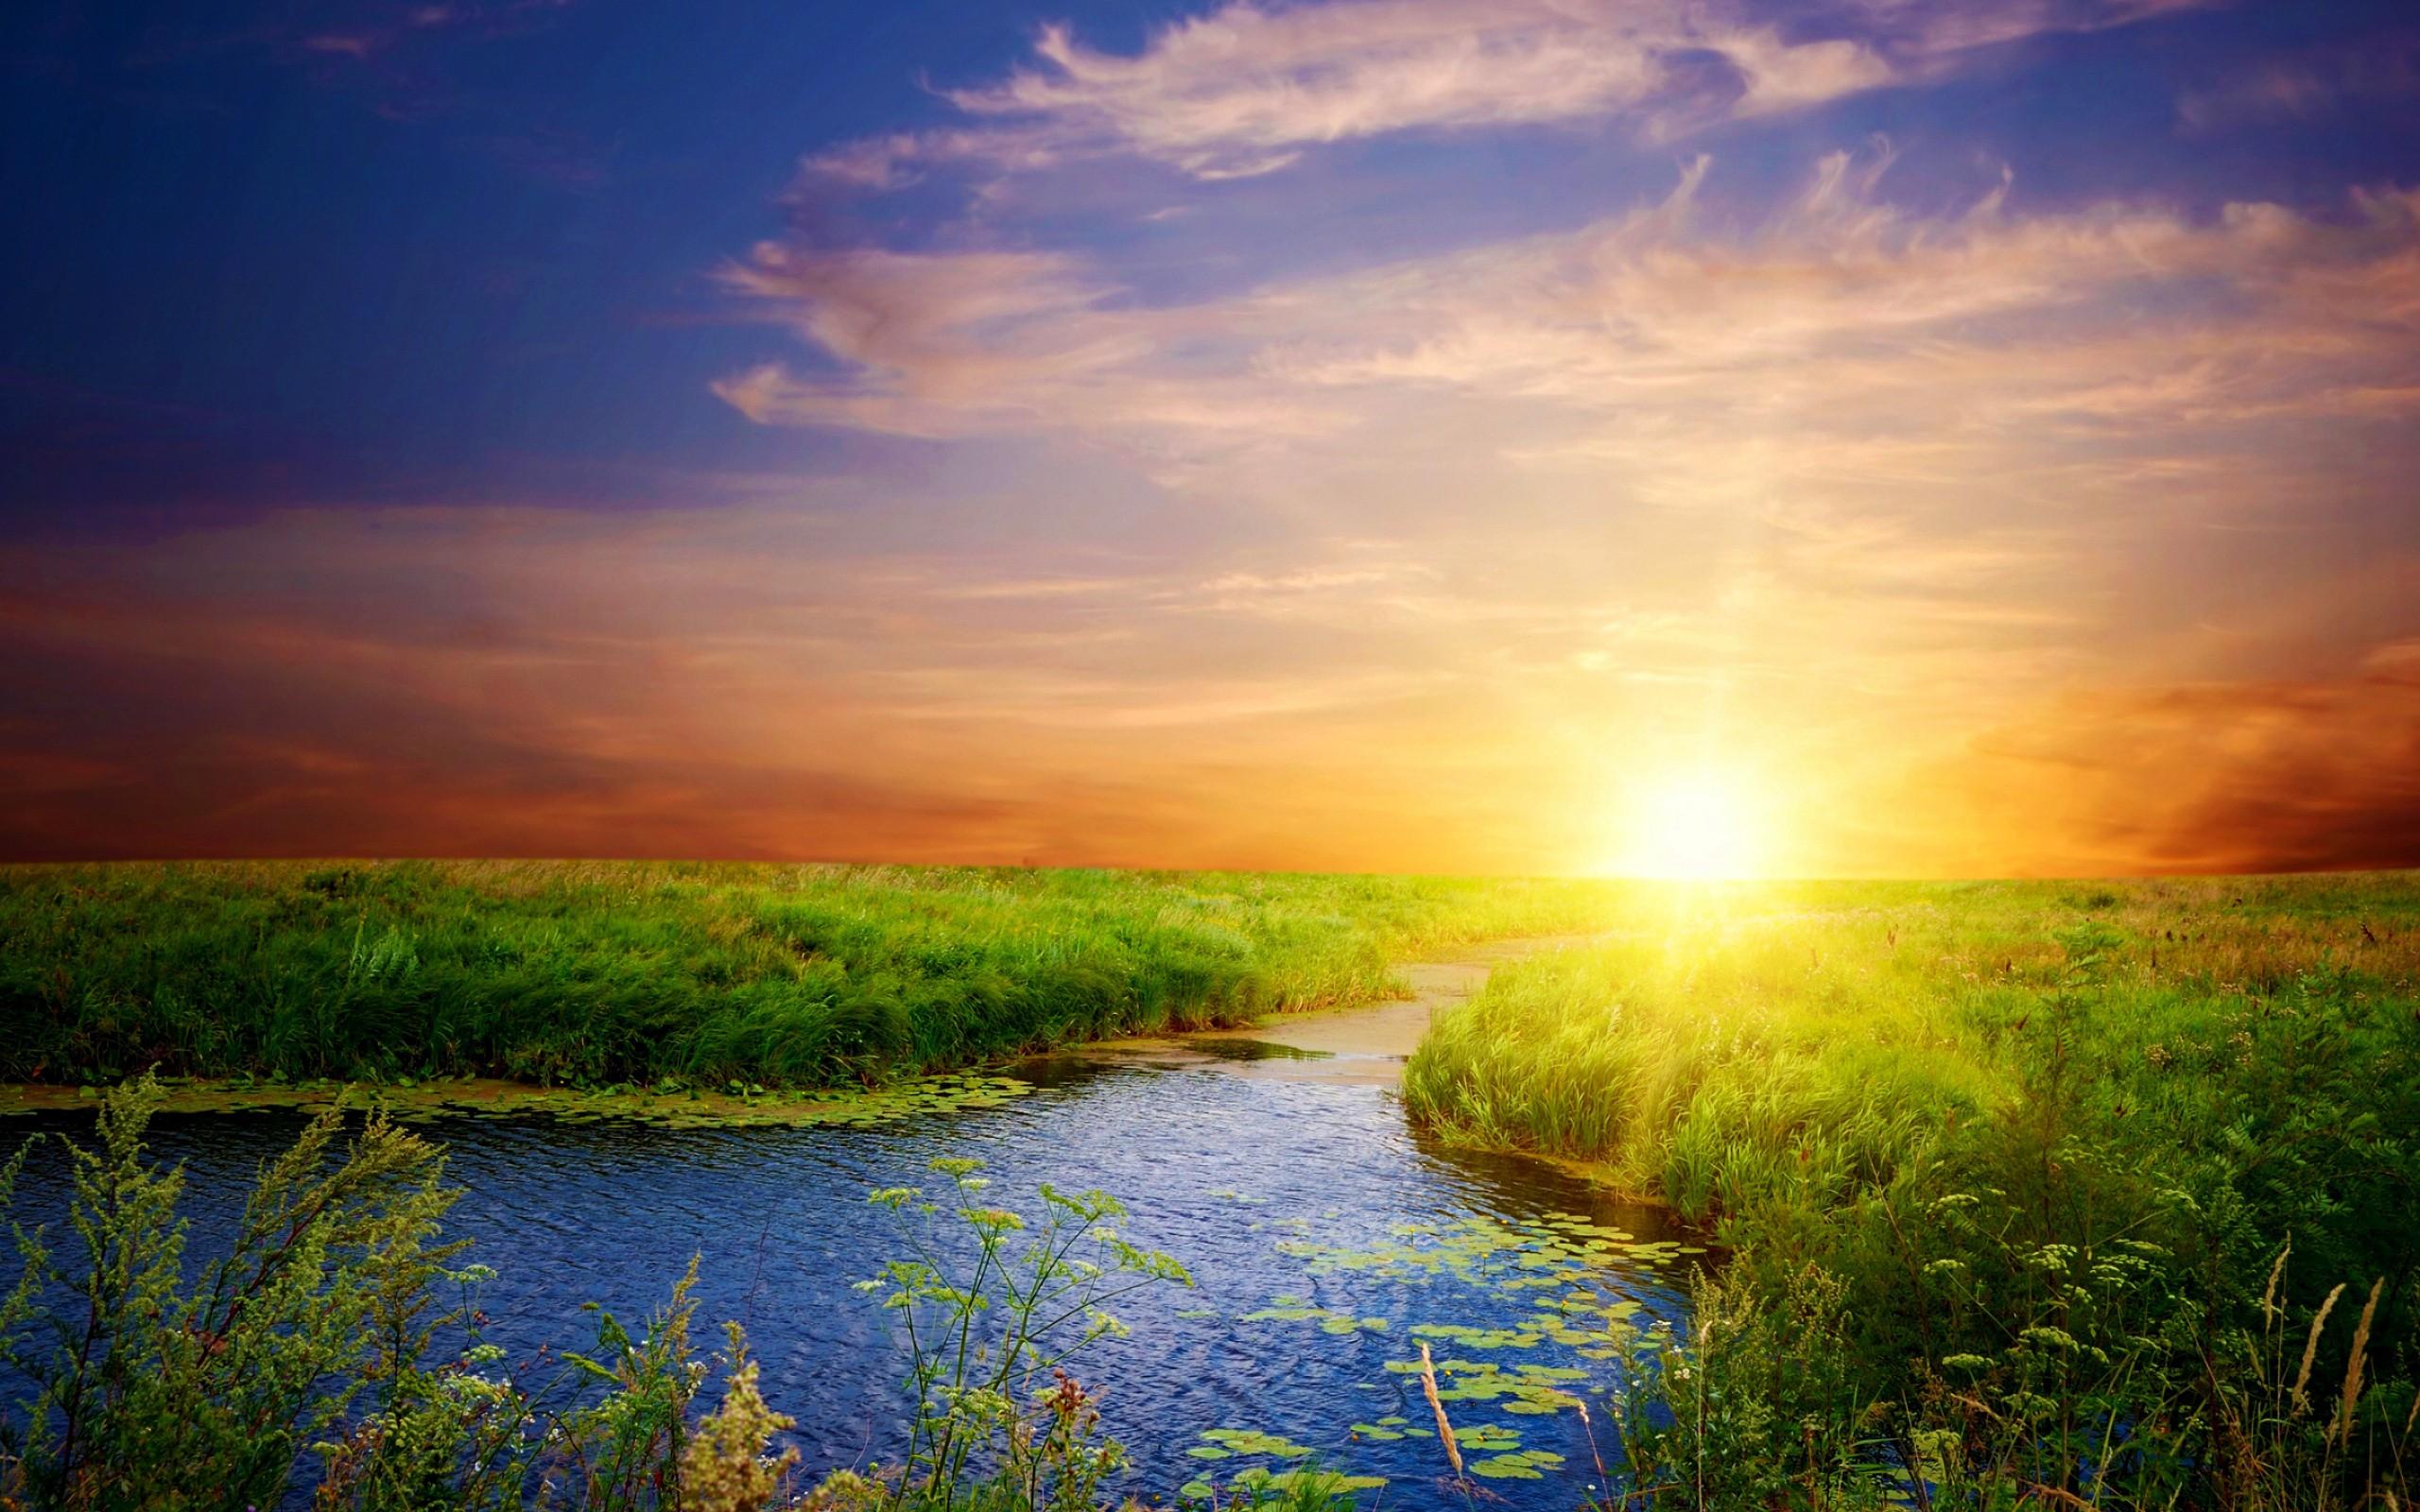 sunlight backgrounds 36054